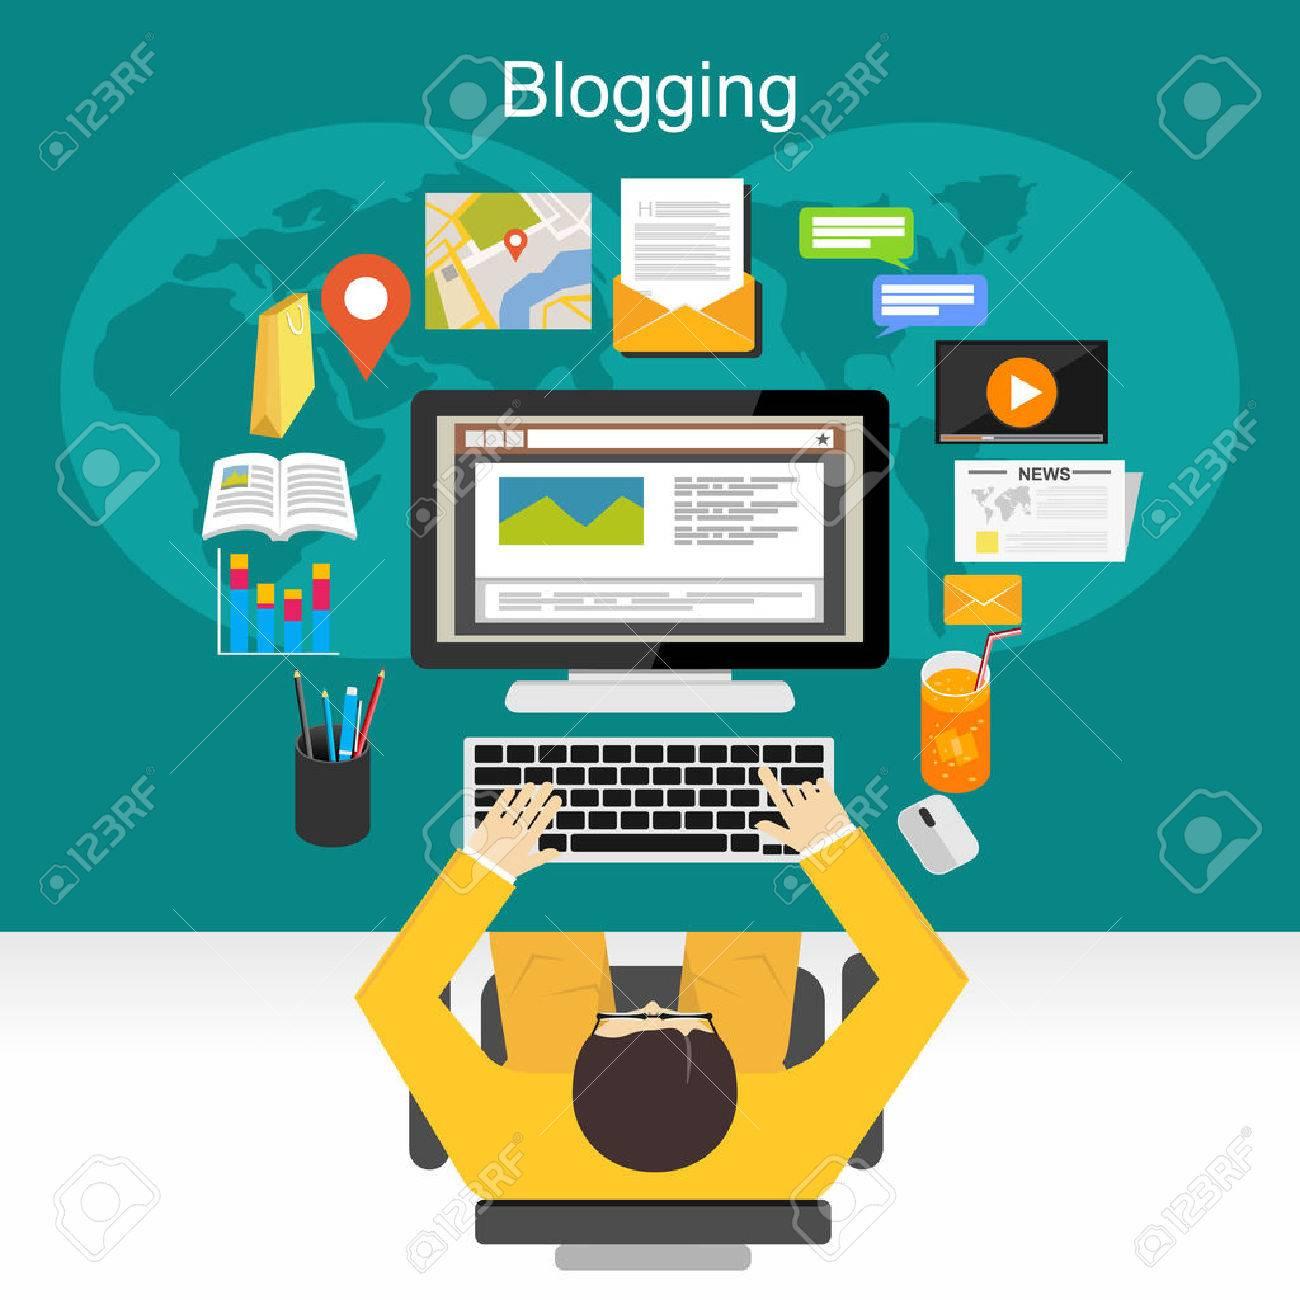 Blogging illustration concept. - 44827466